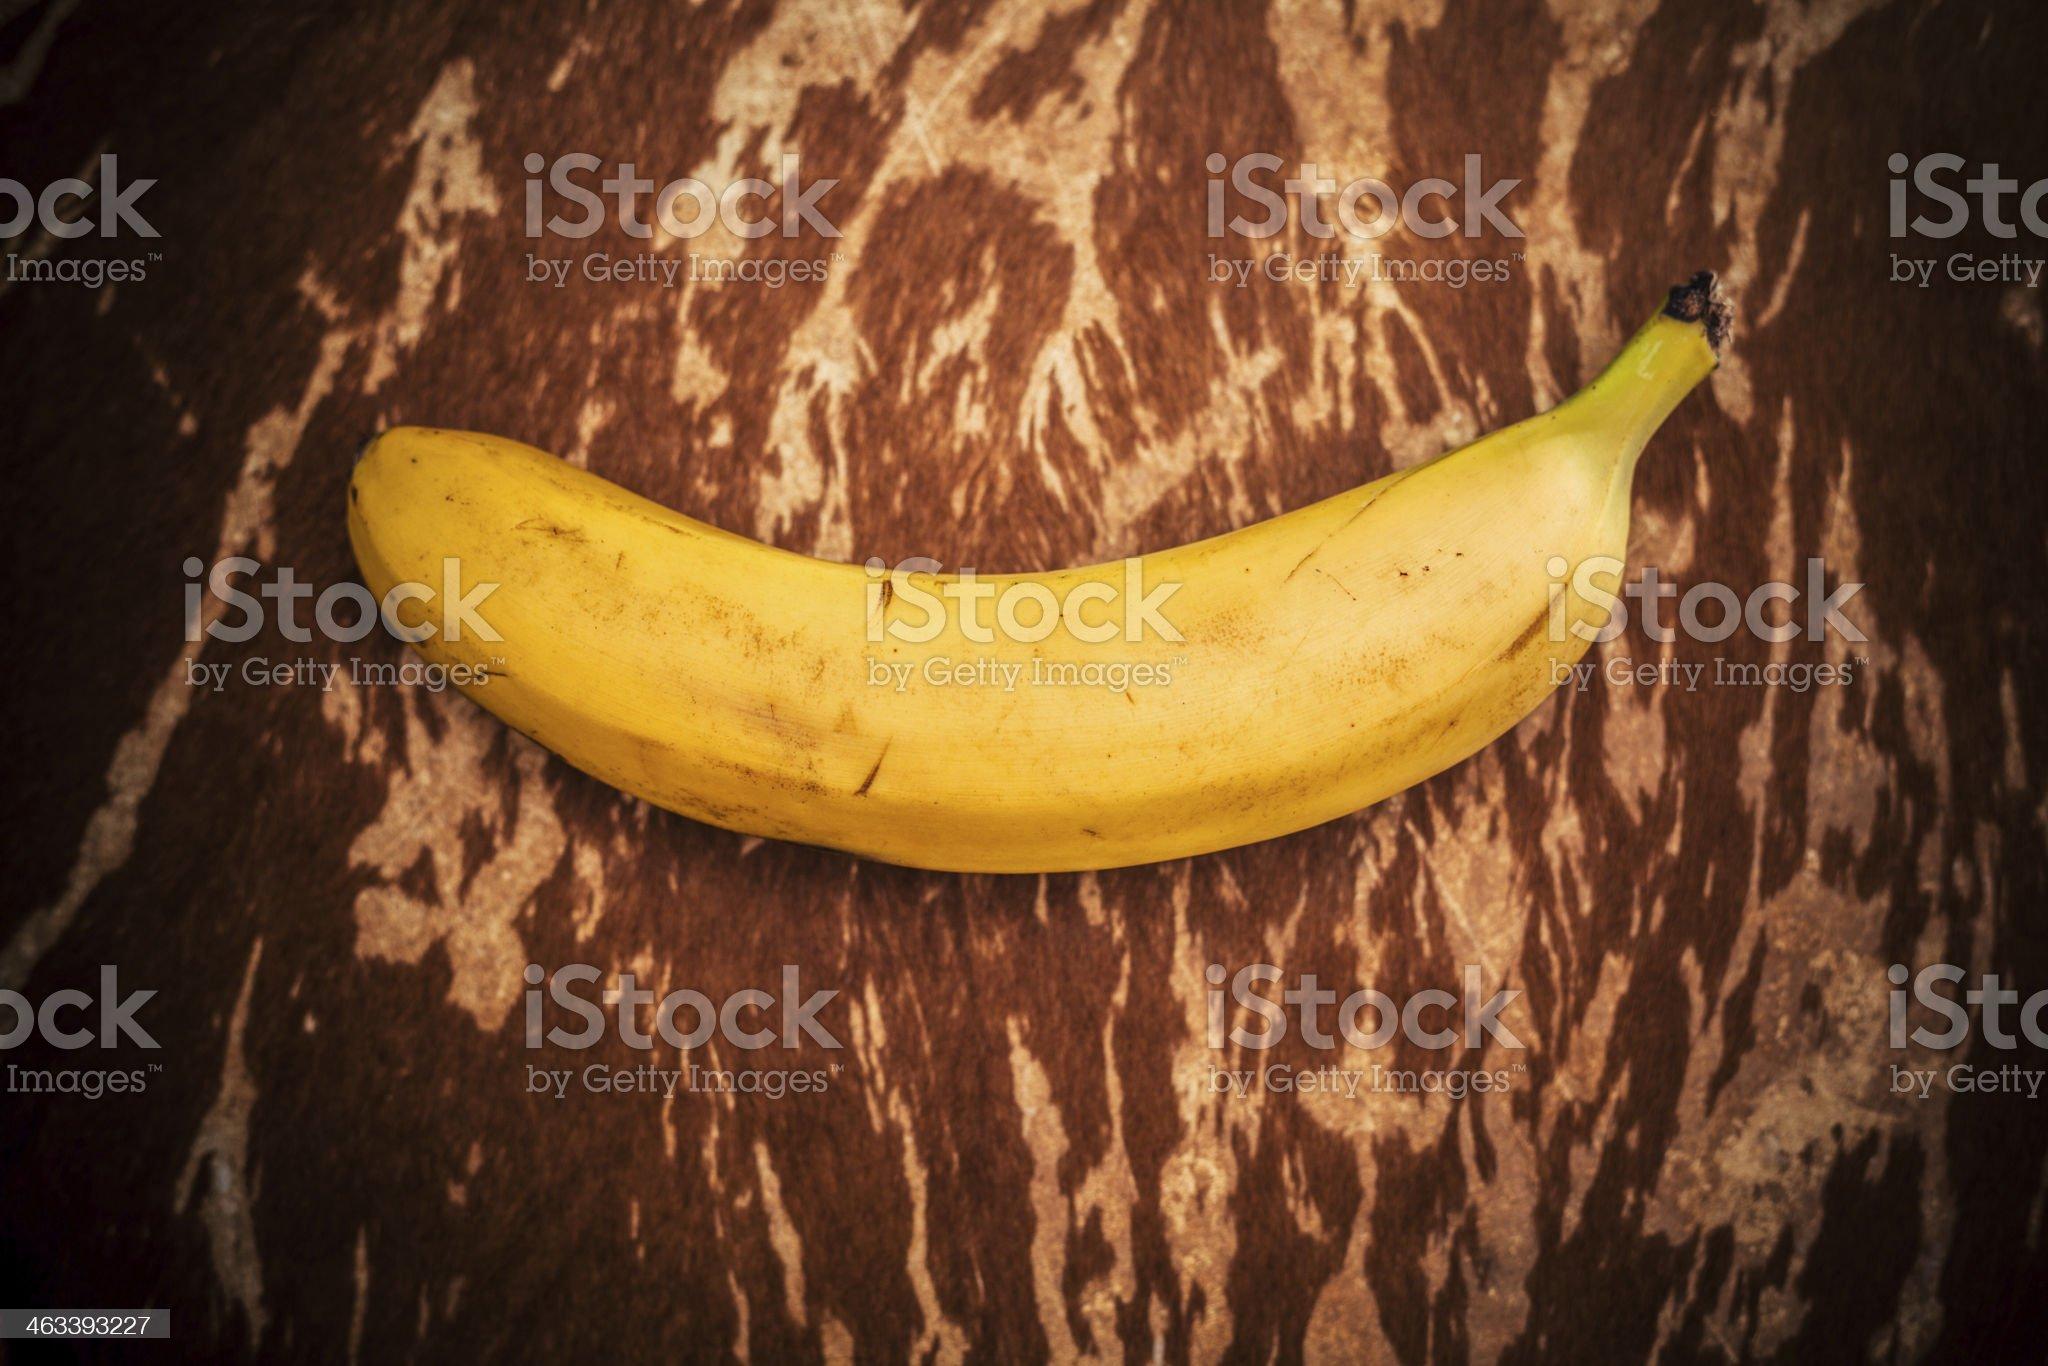 Banana on animal hide royalty-free stock photo